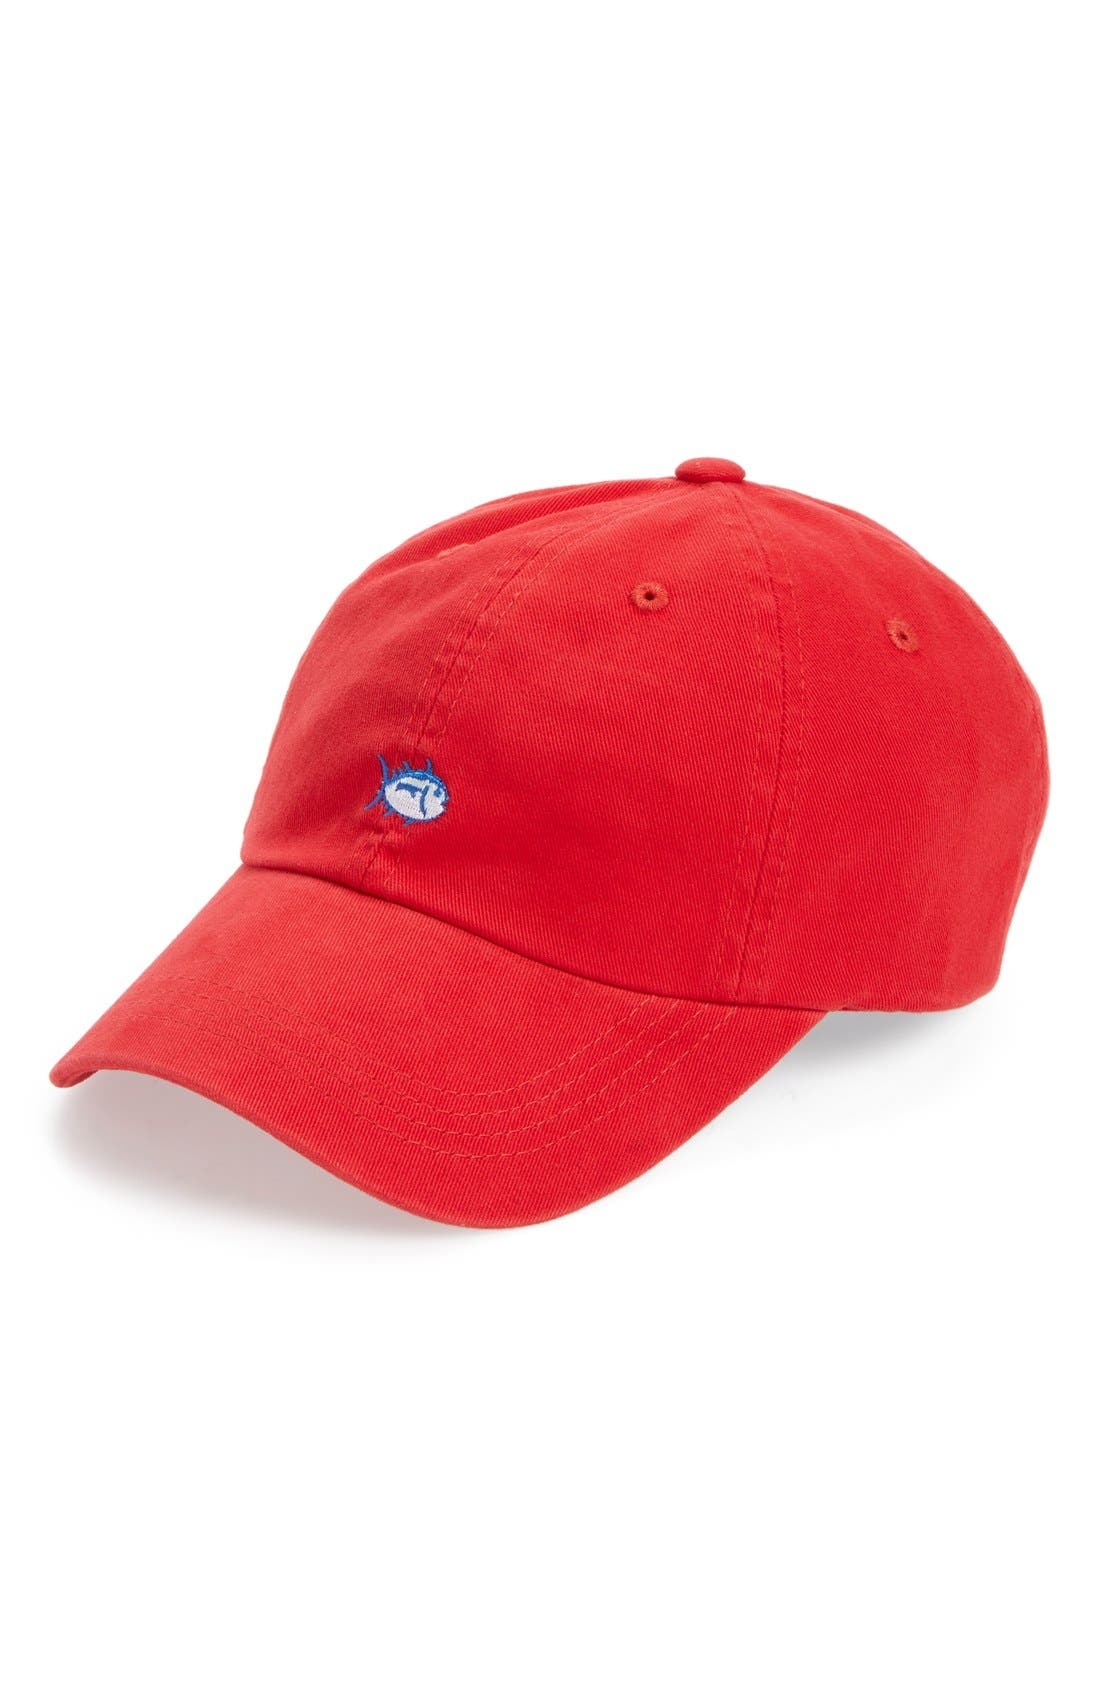 Alternate Image 1 Selected - Southern Tide 'Mini Skipjack' Baseball Cap